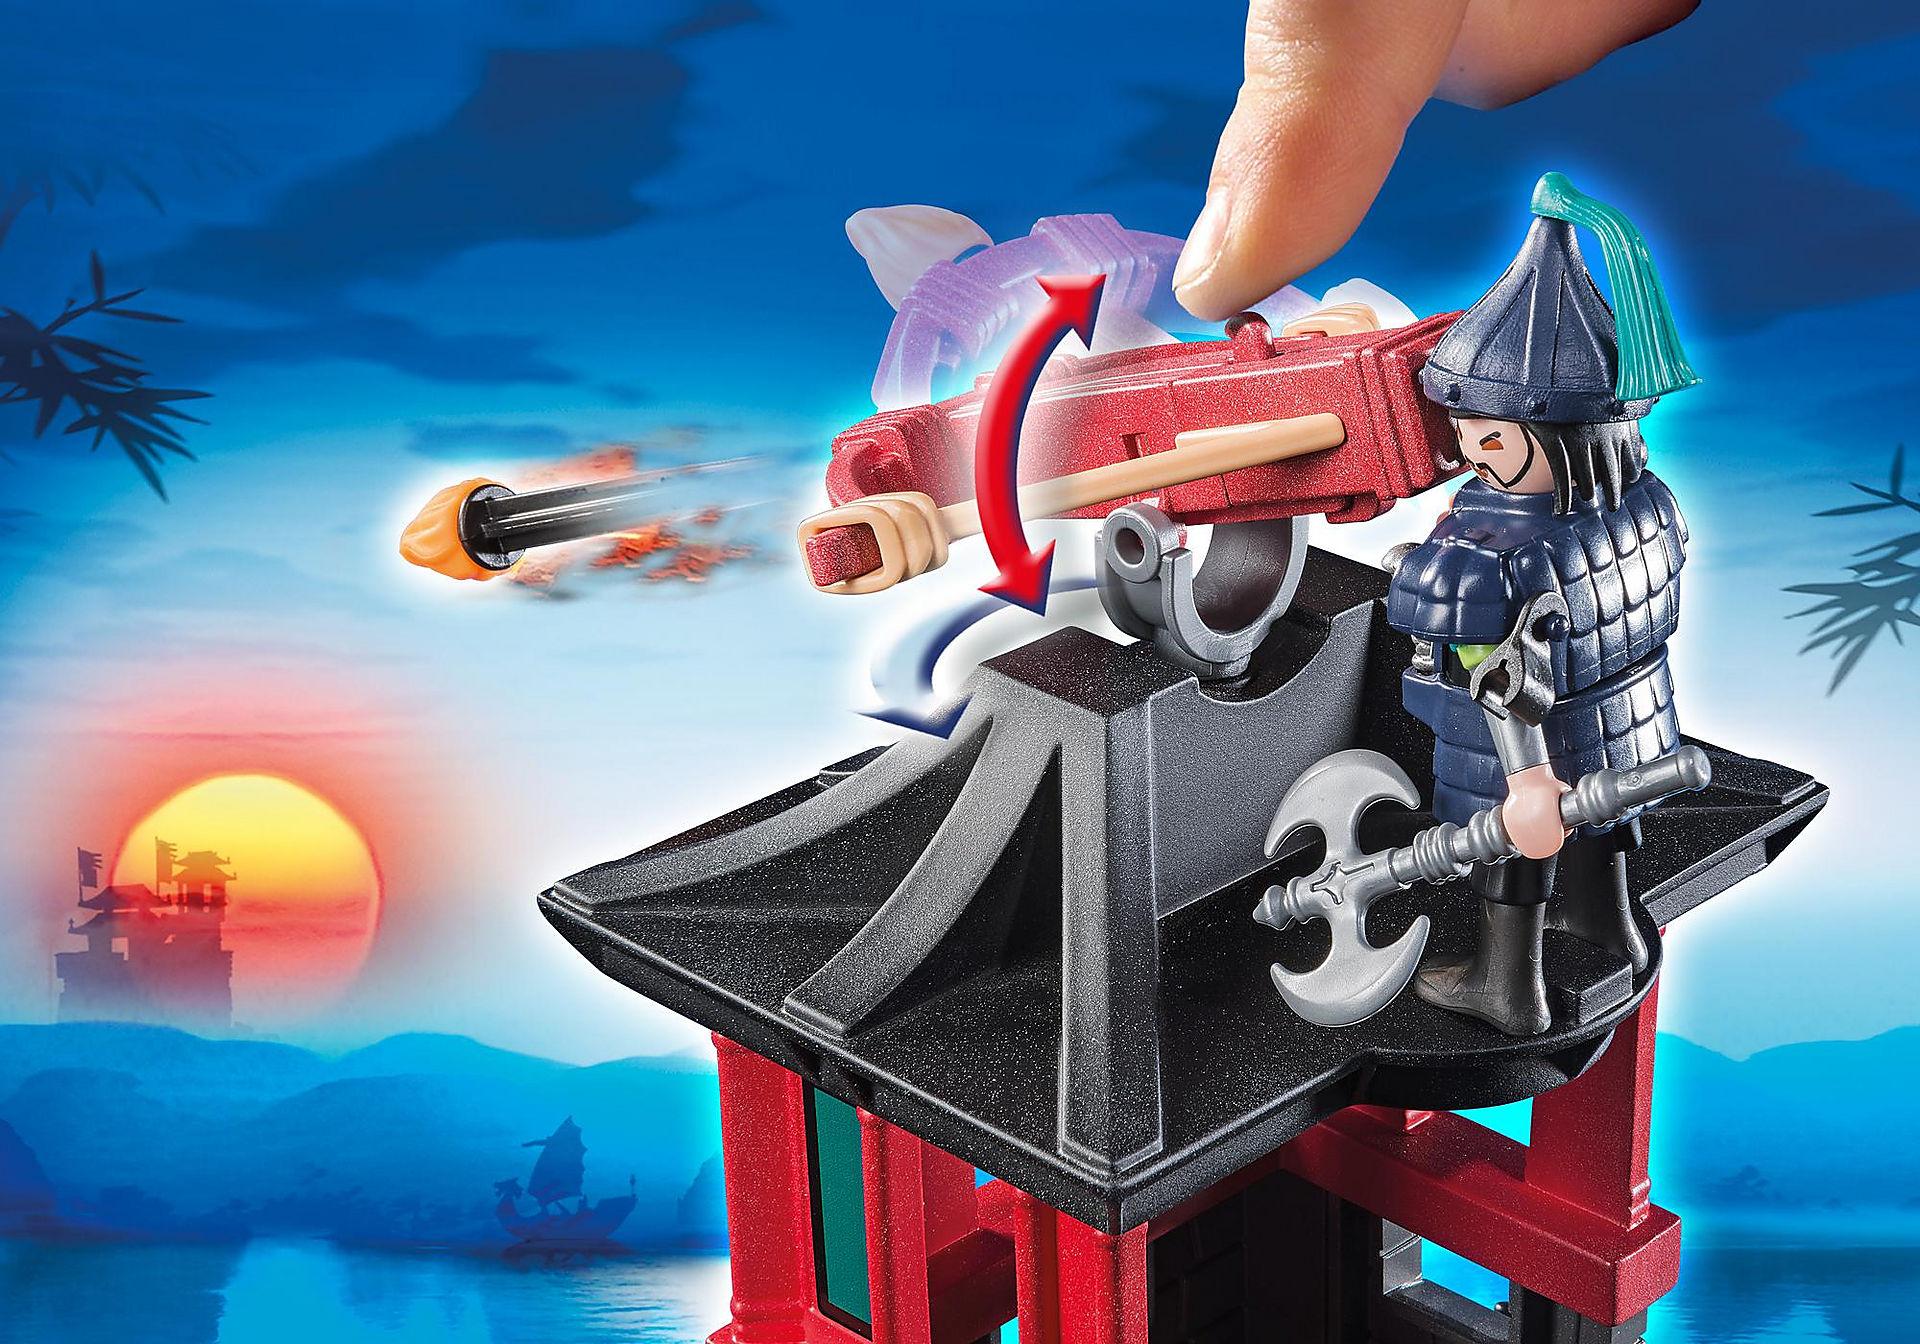 http://media.playmobil.com/i/playmobil/5480_product_extra1/Forte segreto del Drago